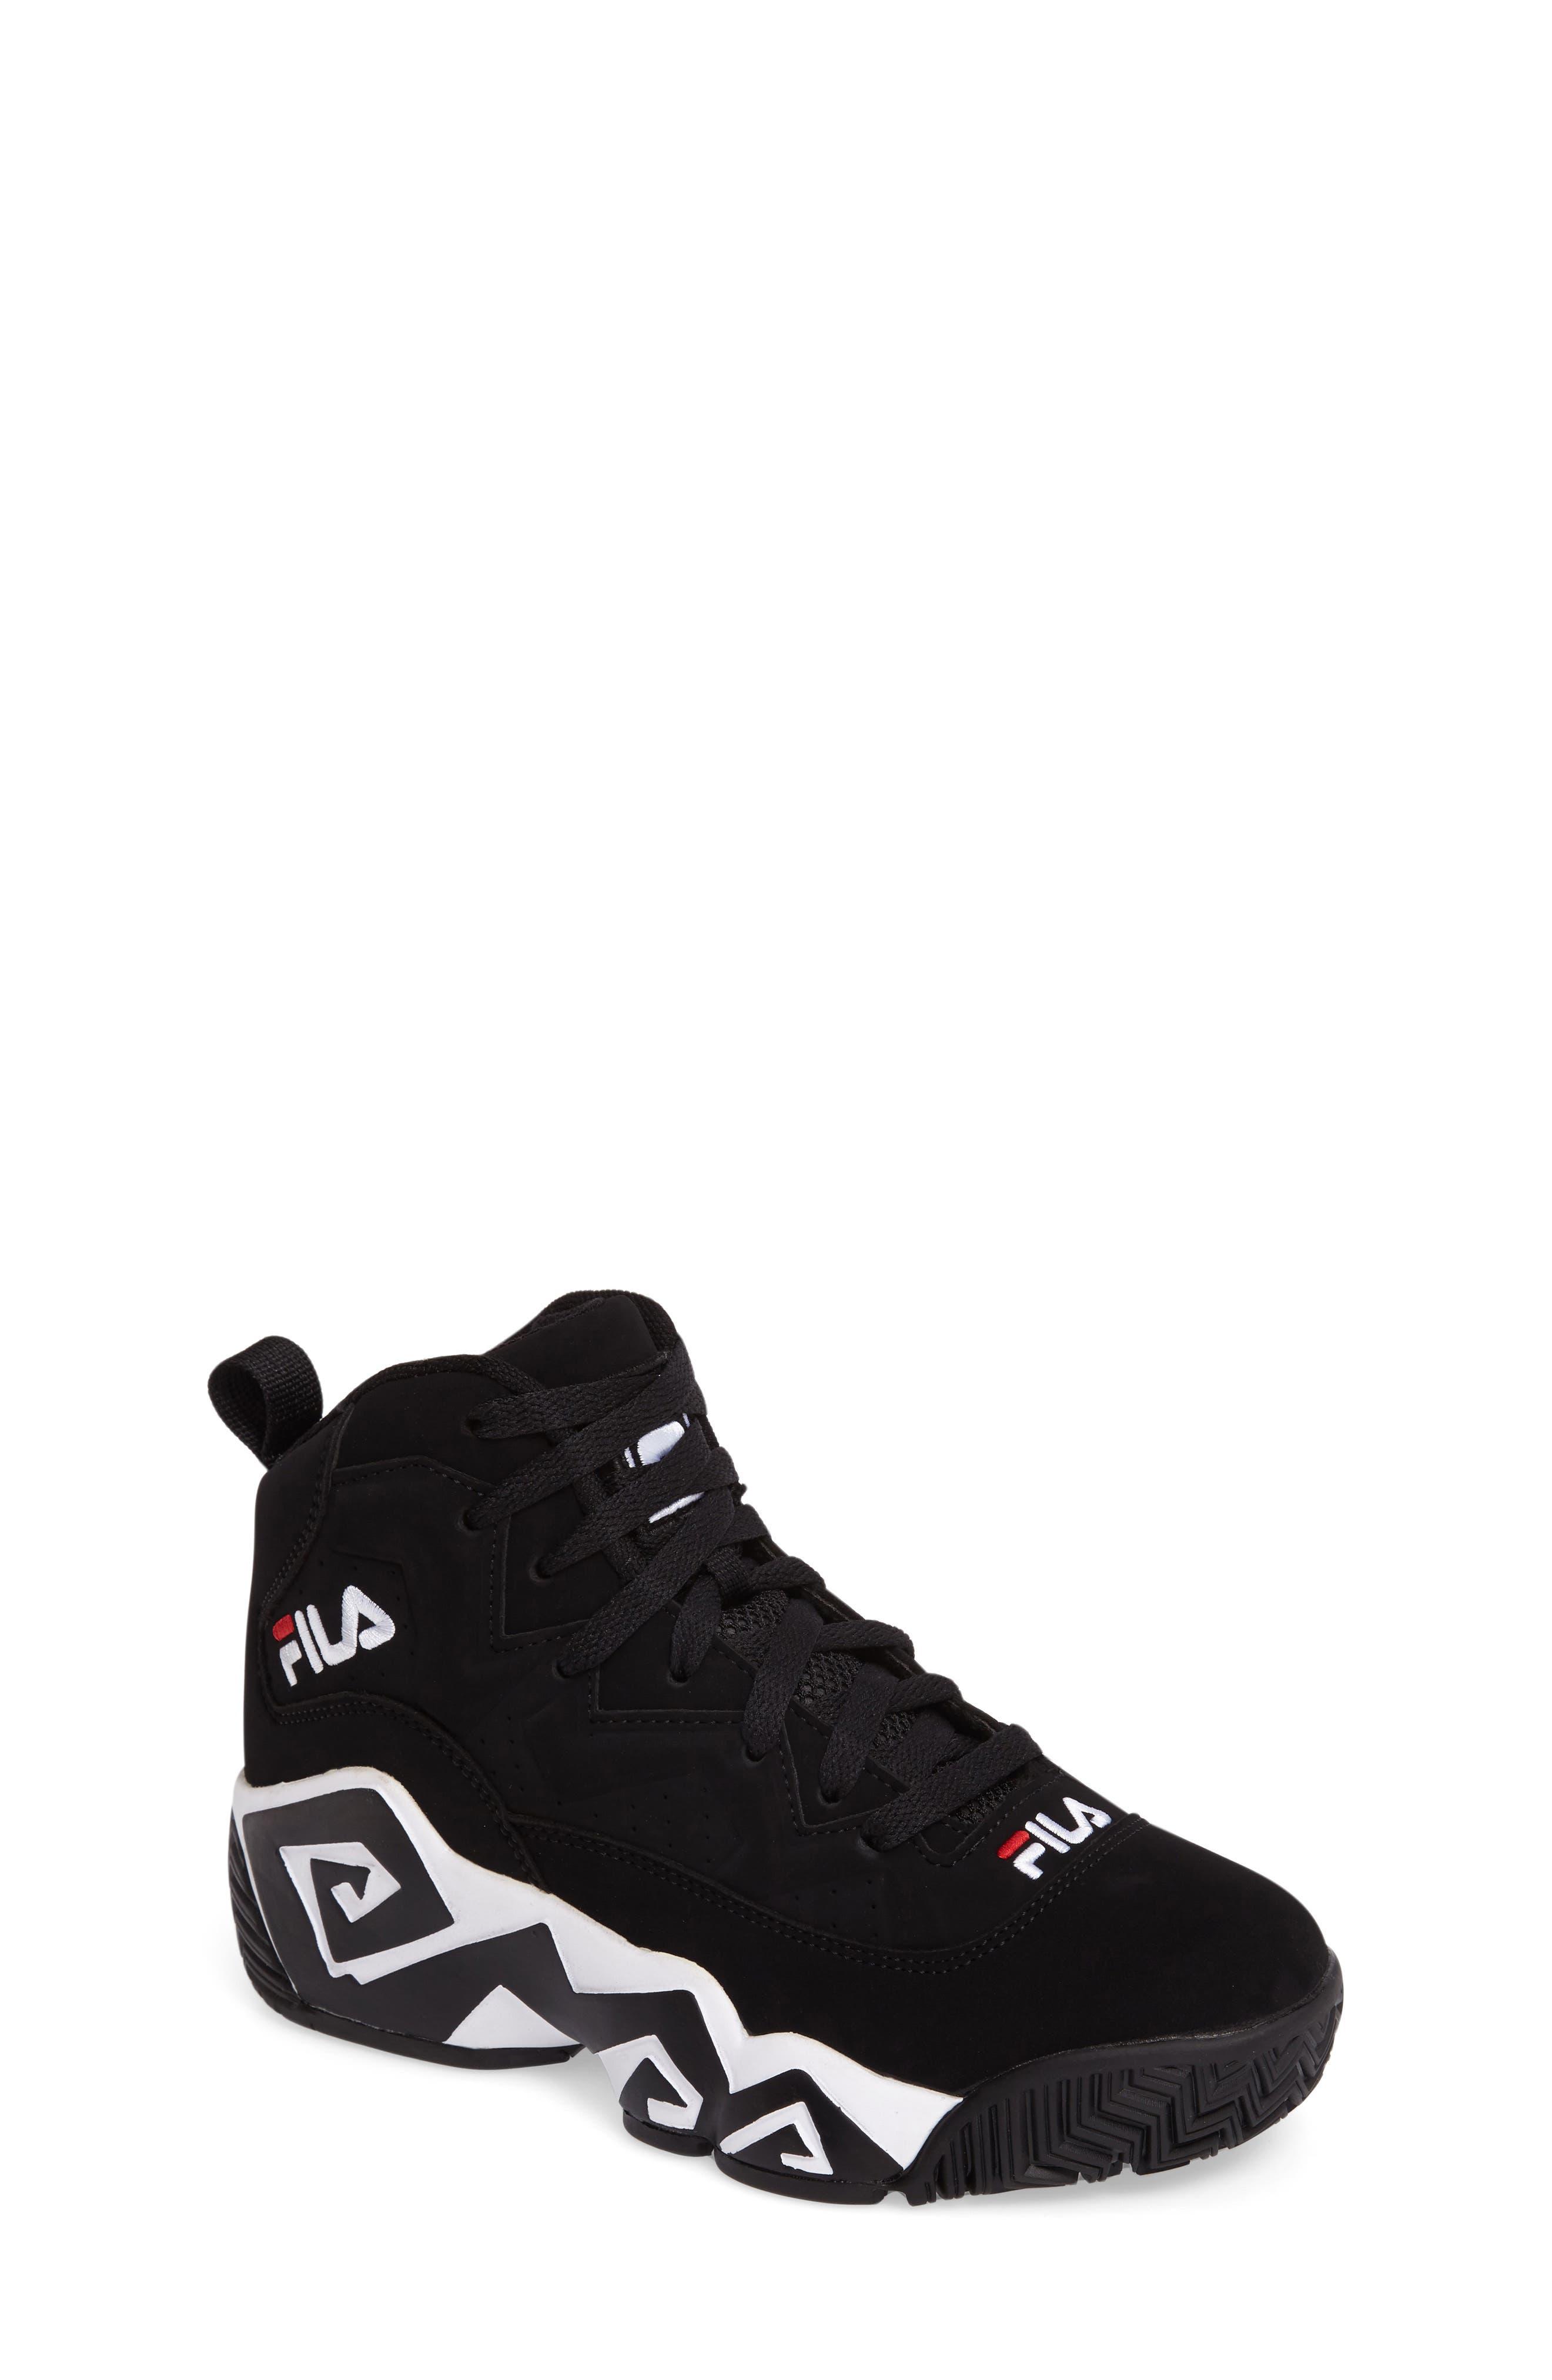 Heritage Sneaker,                             Main thumbnail 1, color,                             Black/ White Nubuck Leather